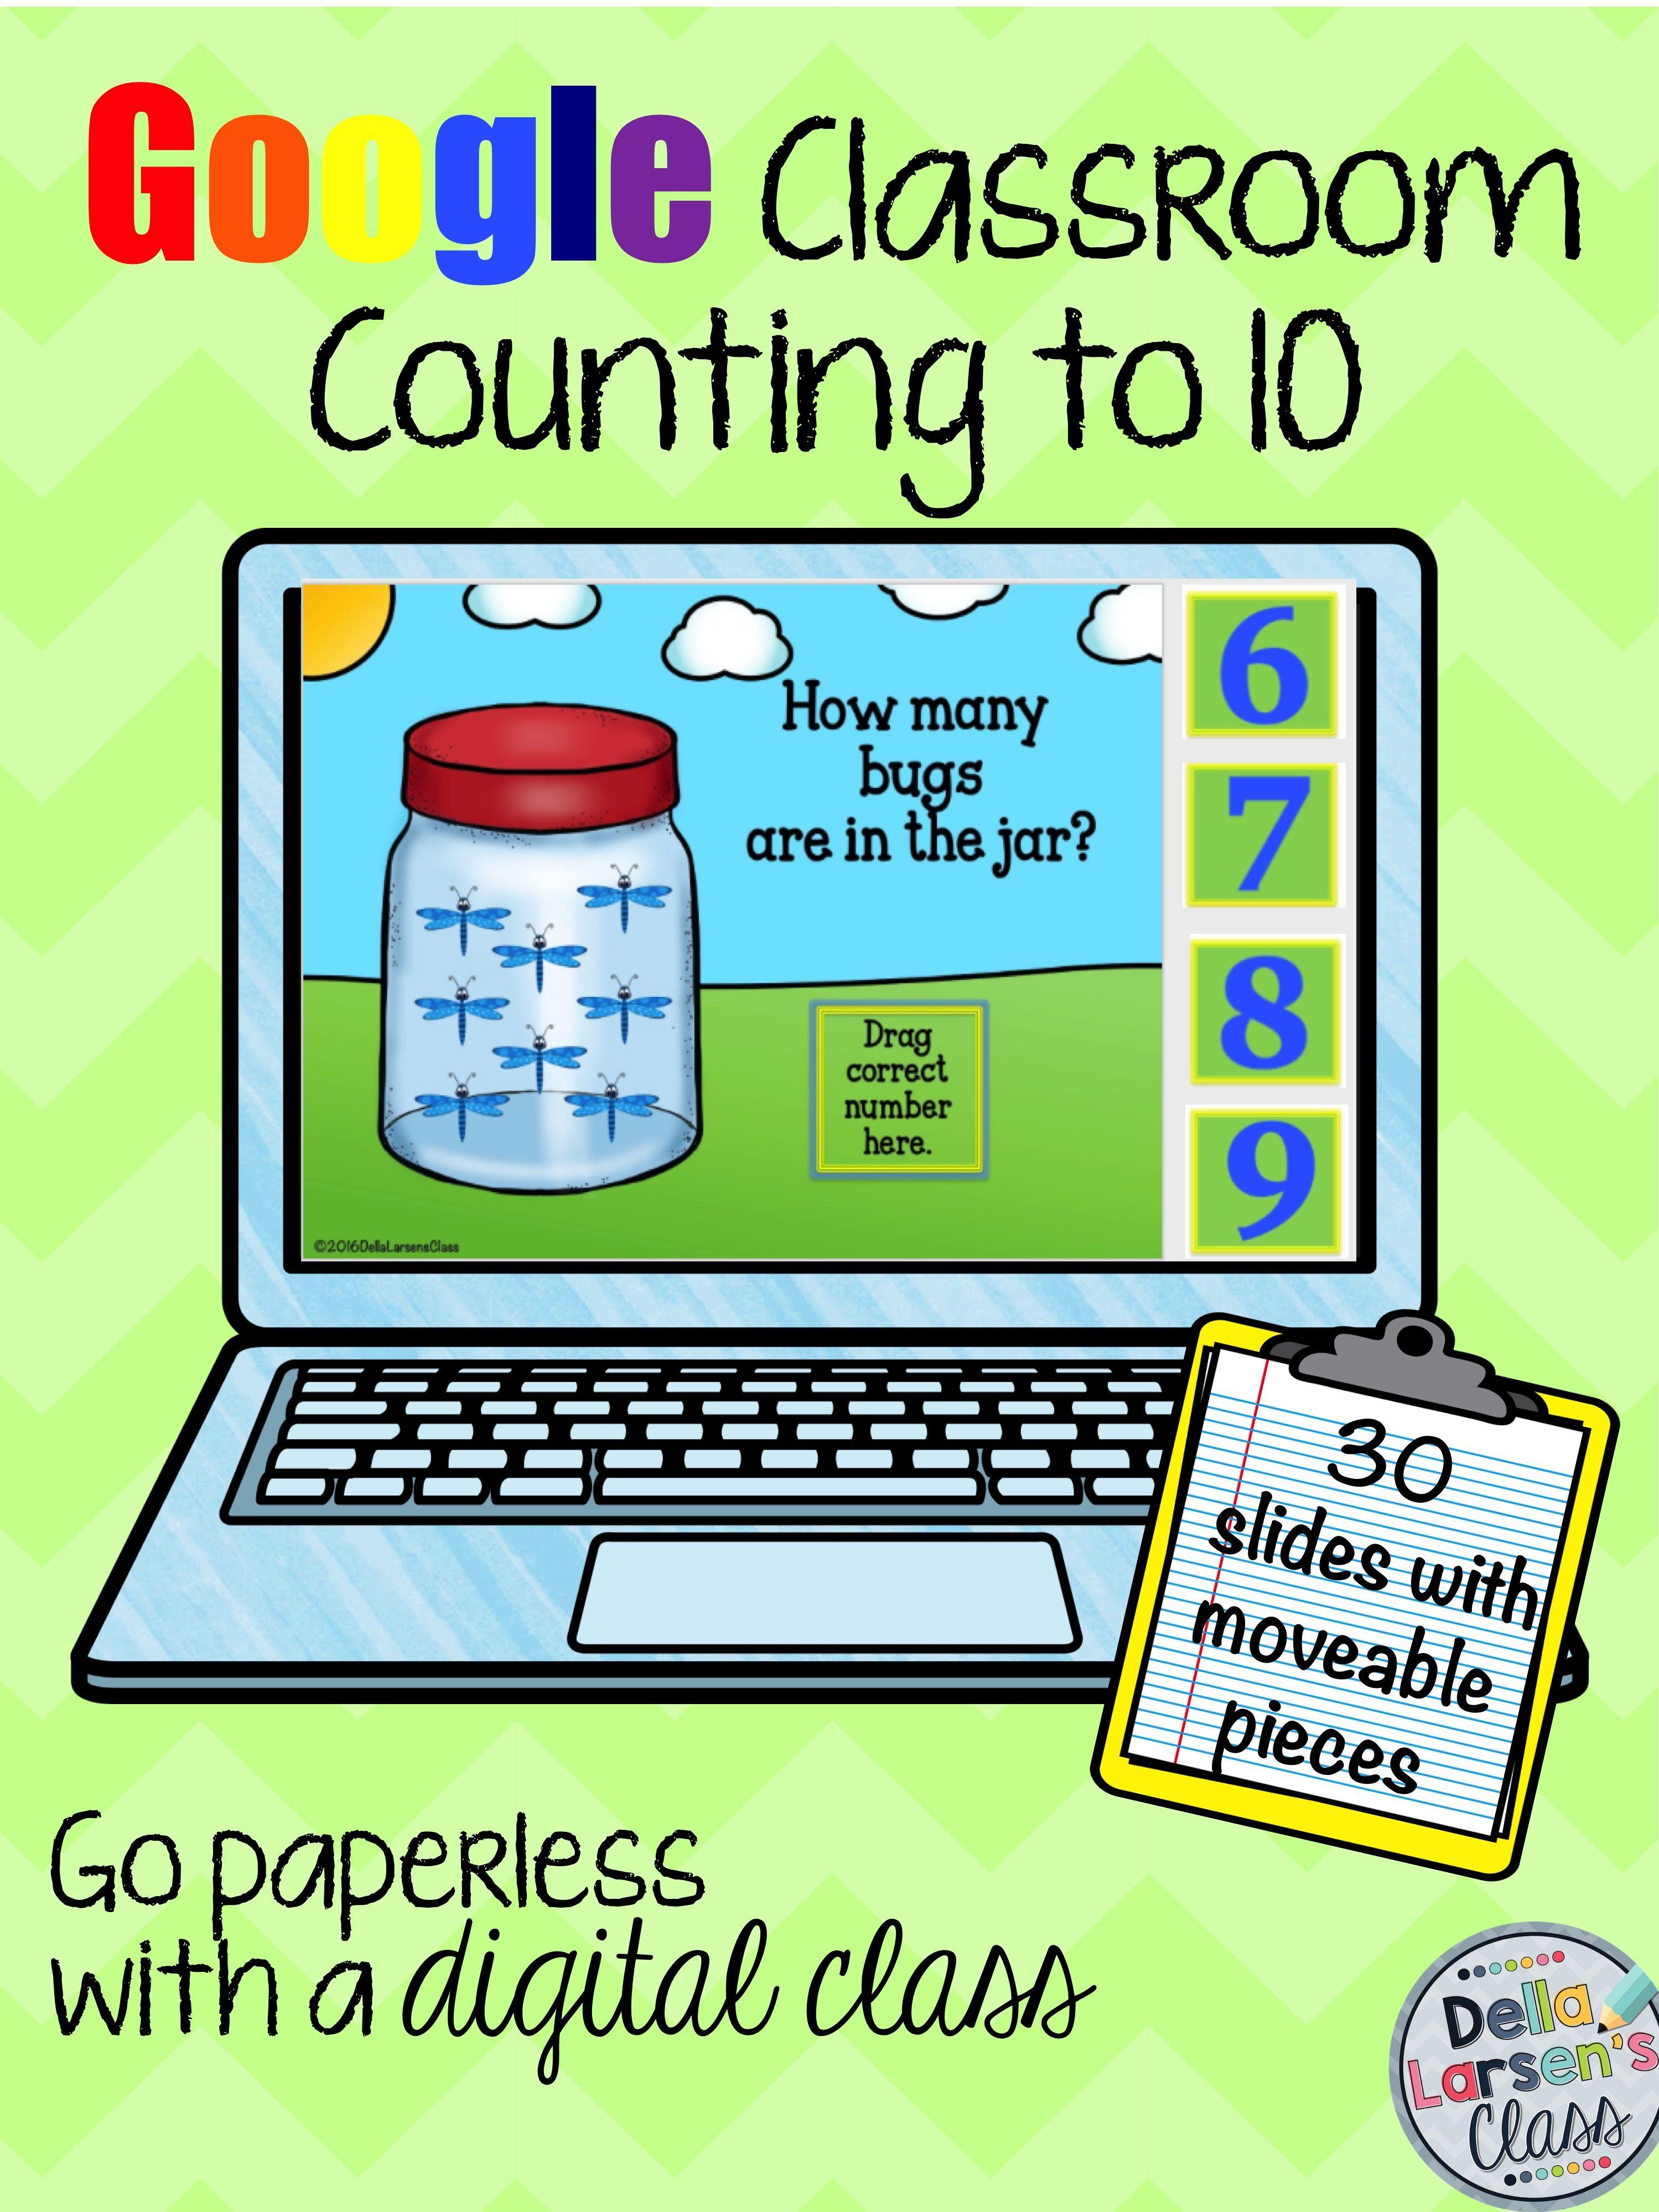 Google Classroom Counting to 10   Della Larsen\'s Class   Pinterest ...